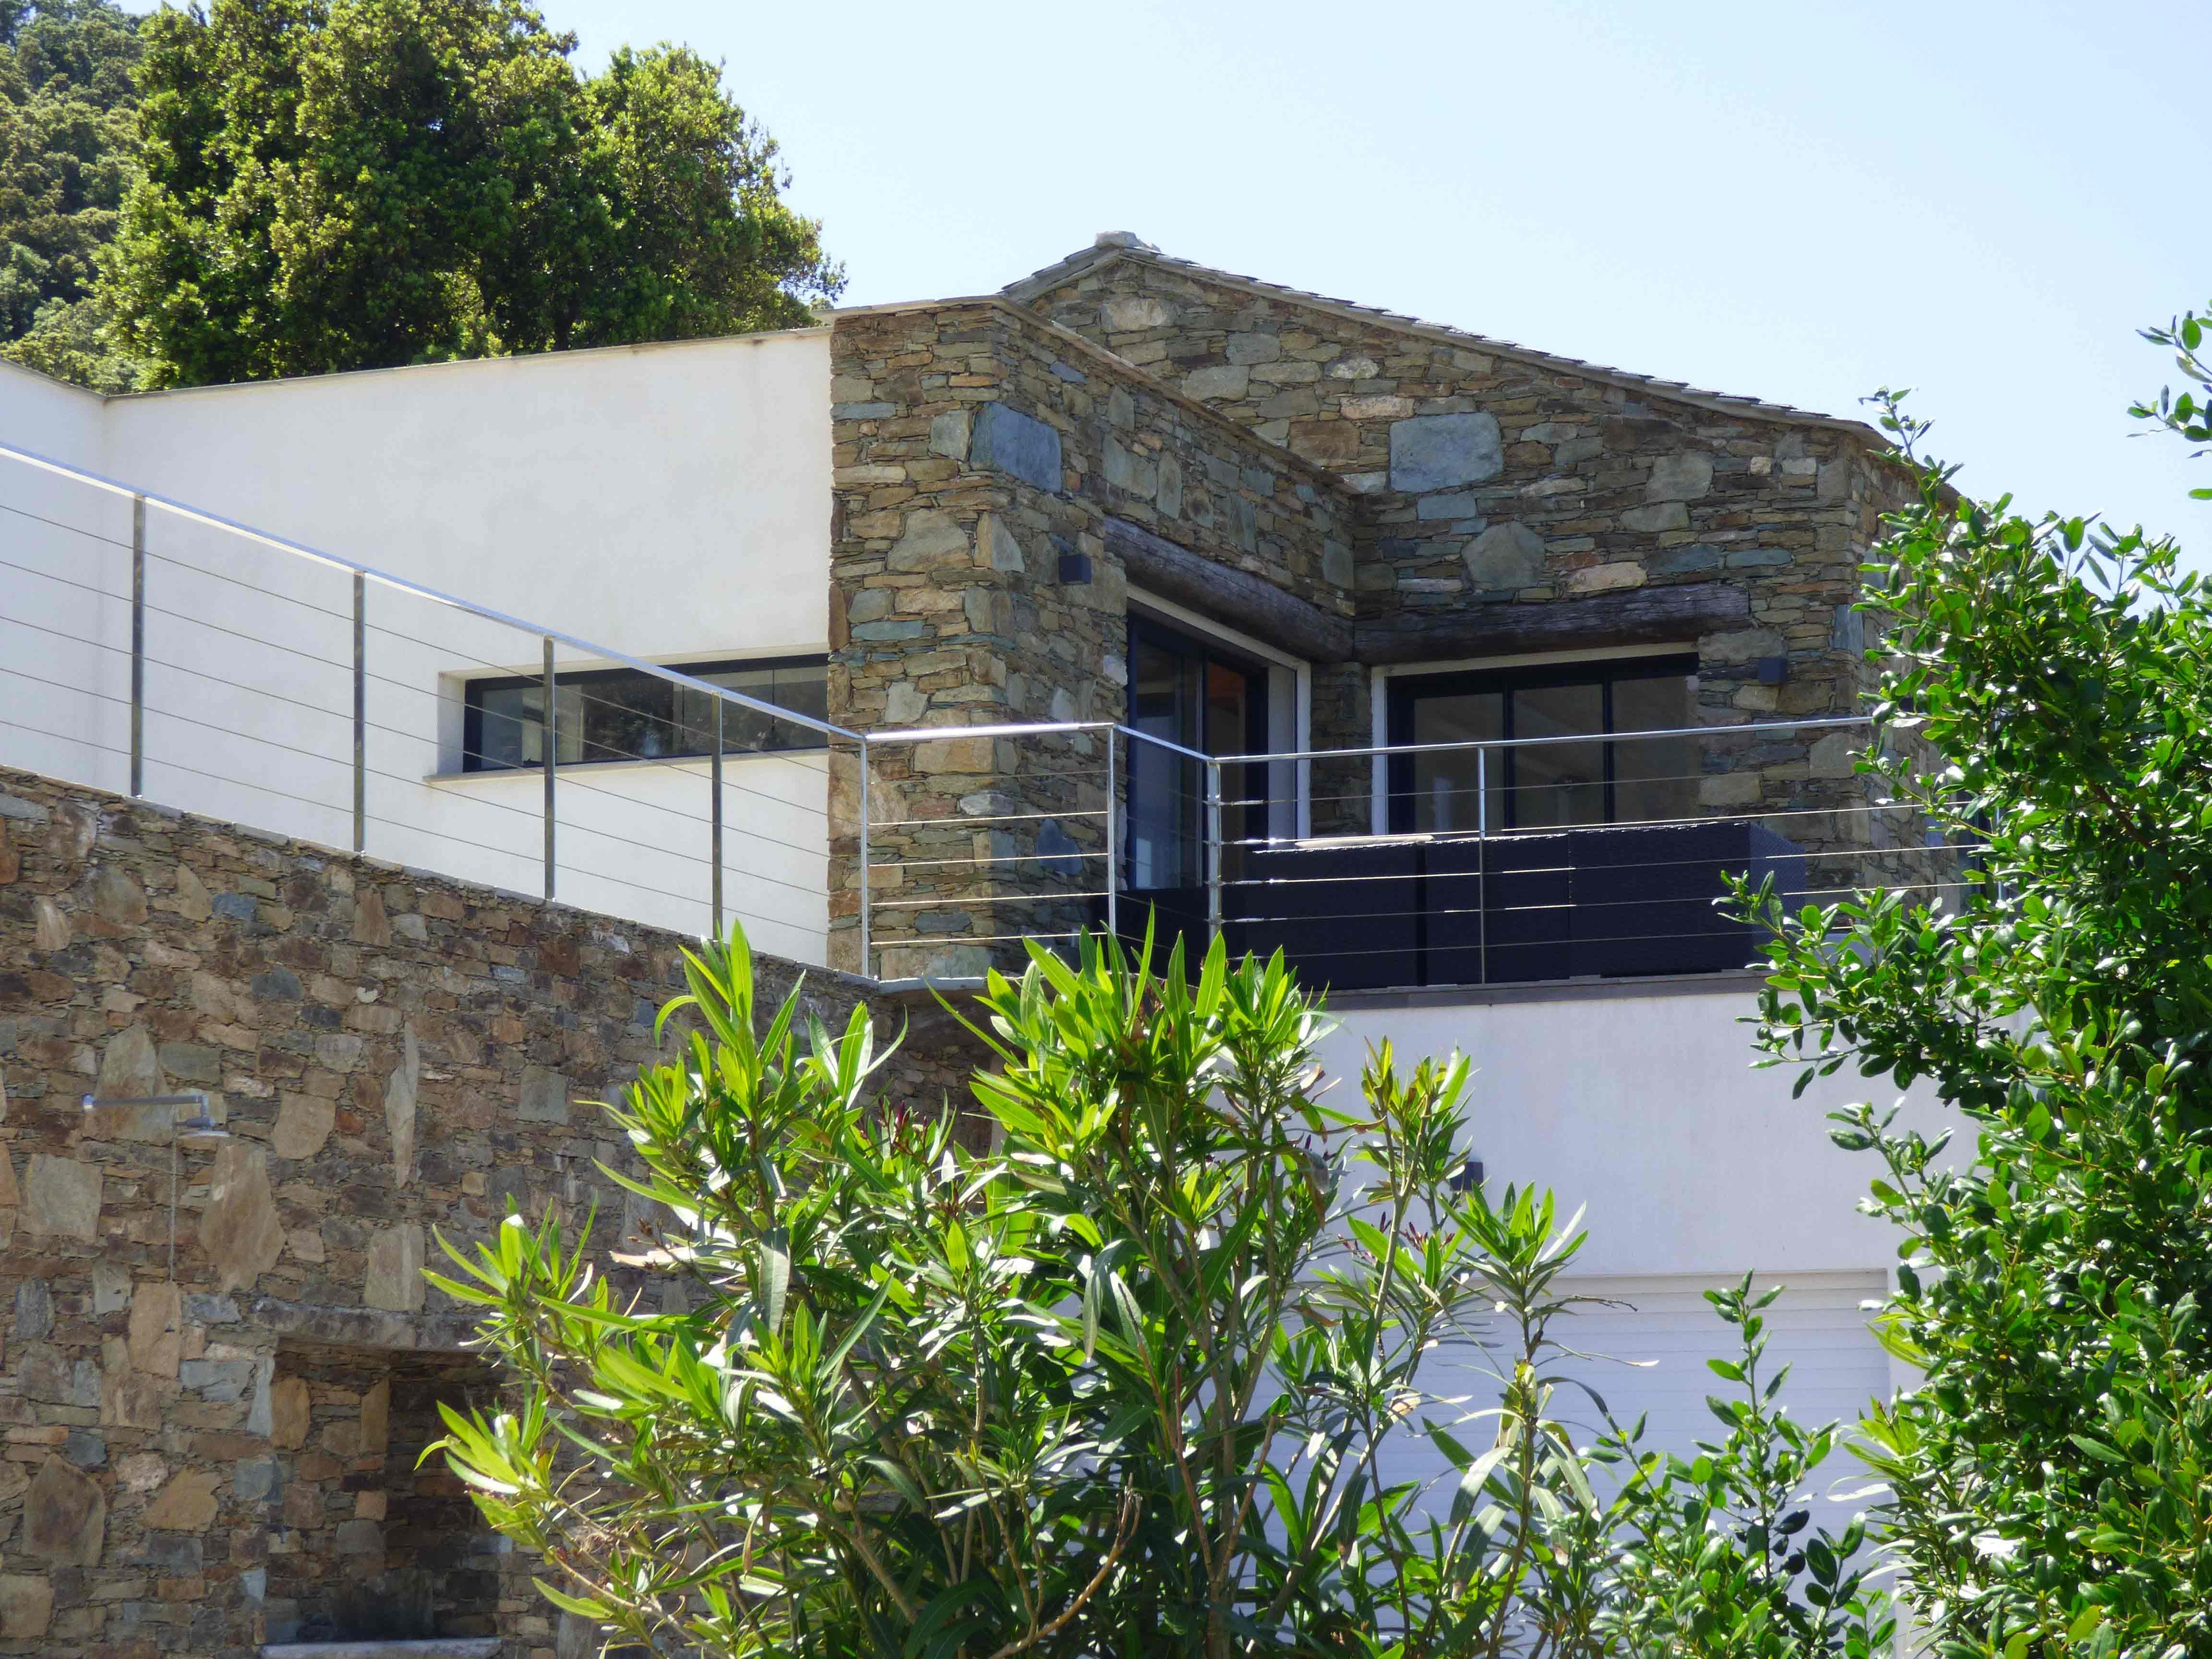 locations de vacances avec piscine spa pino dans le cap corse villa d 39 architecte avec. Black Bedroom Furniture Sets. Home Design Ideas